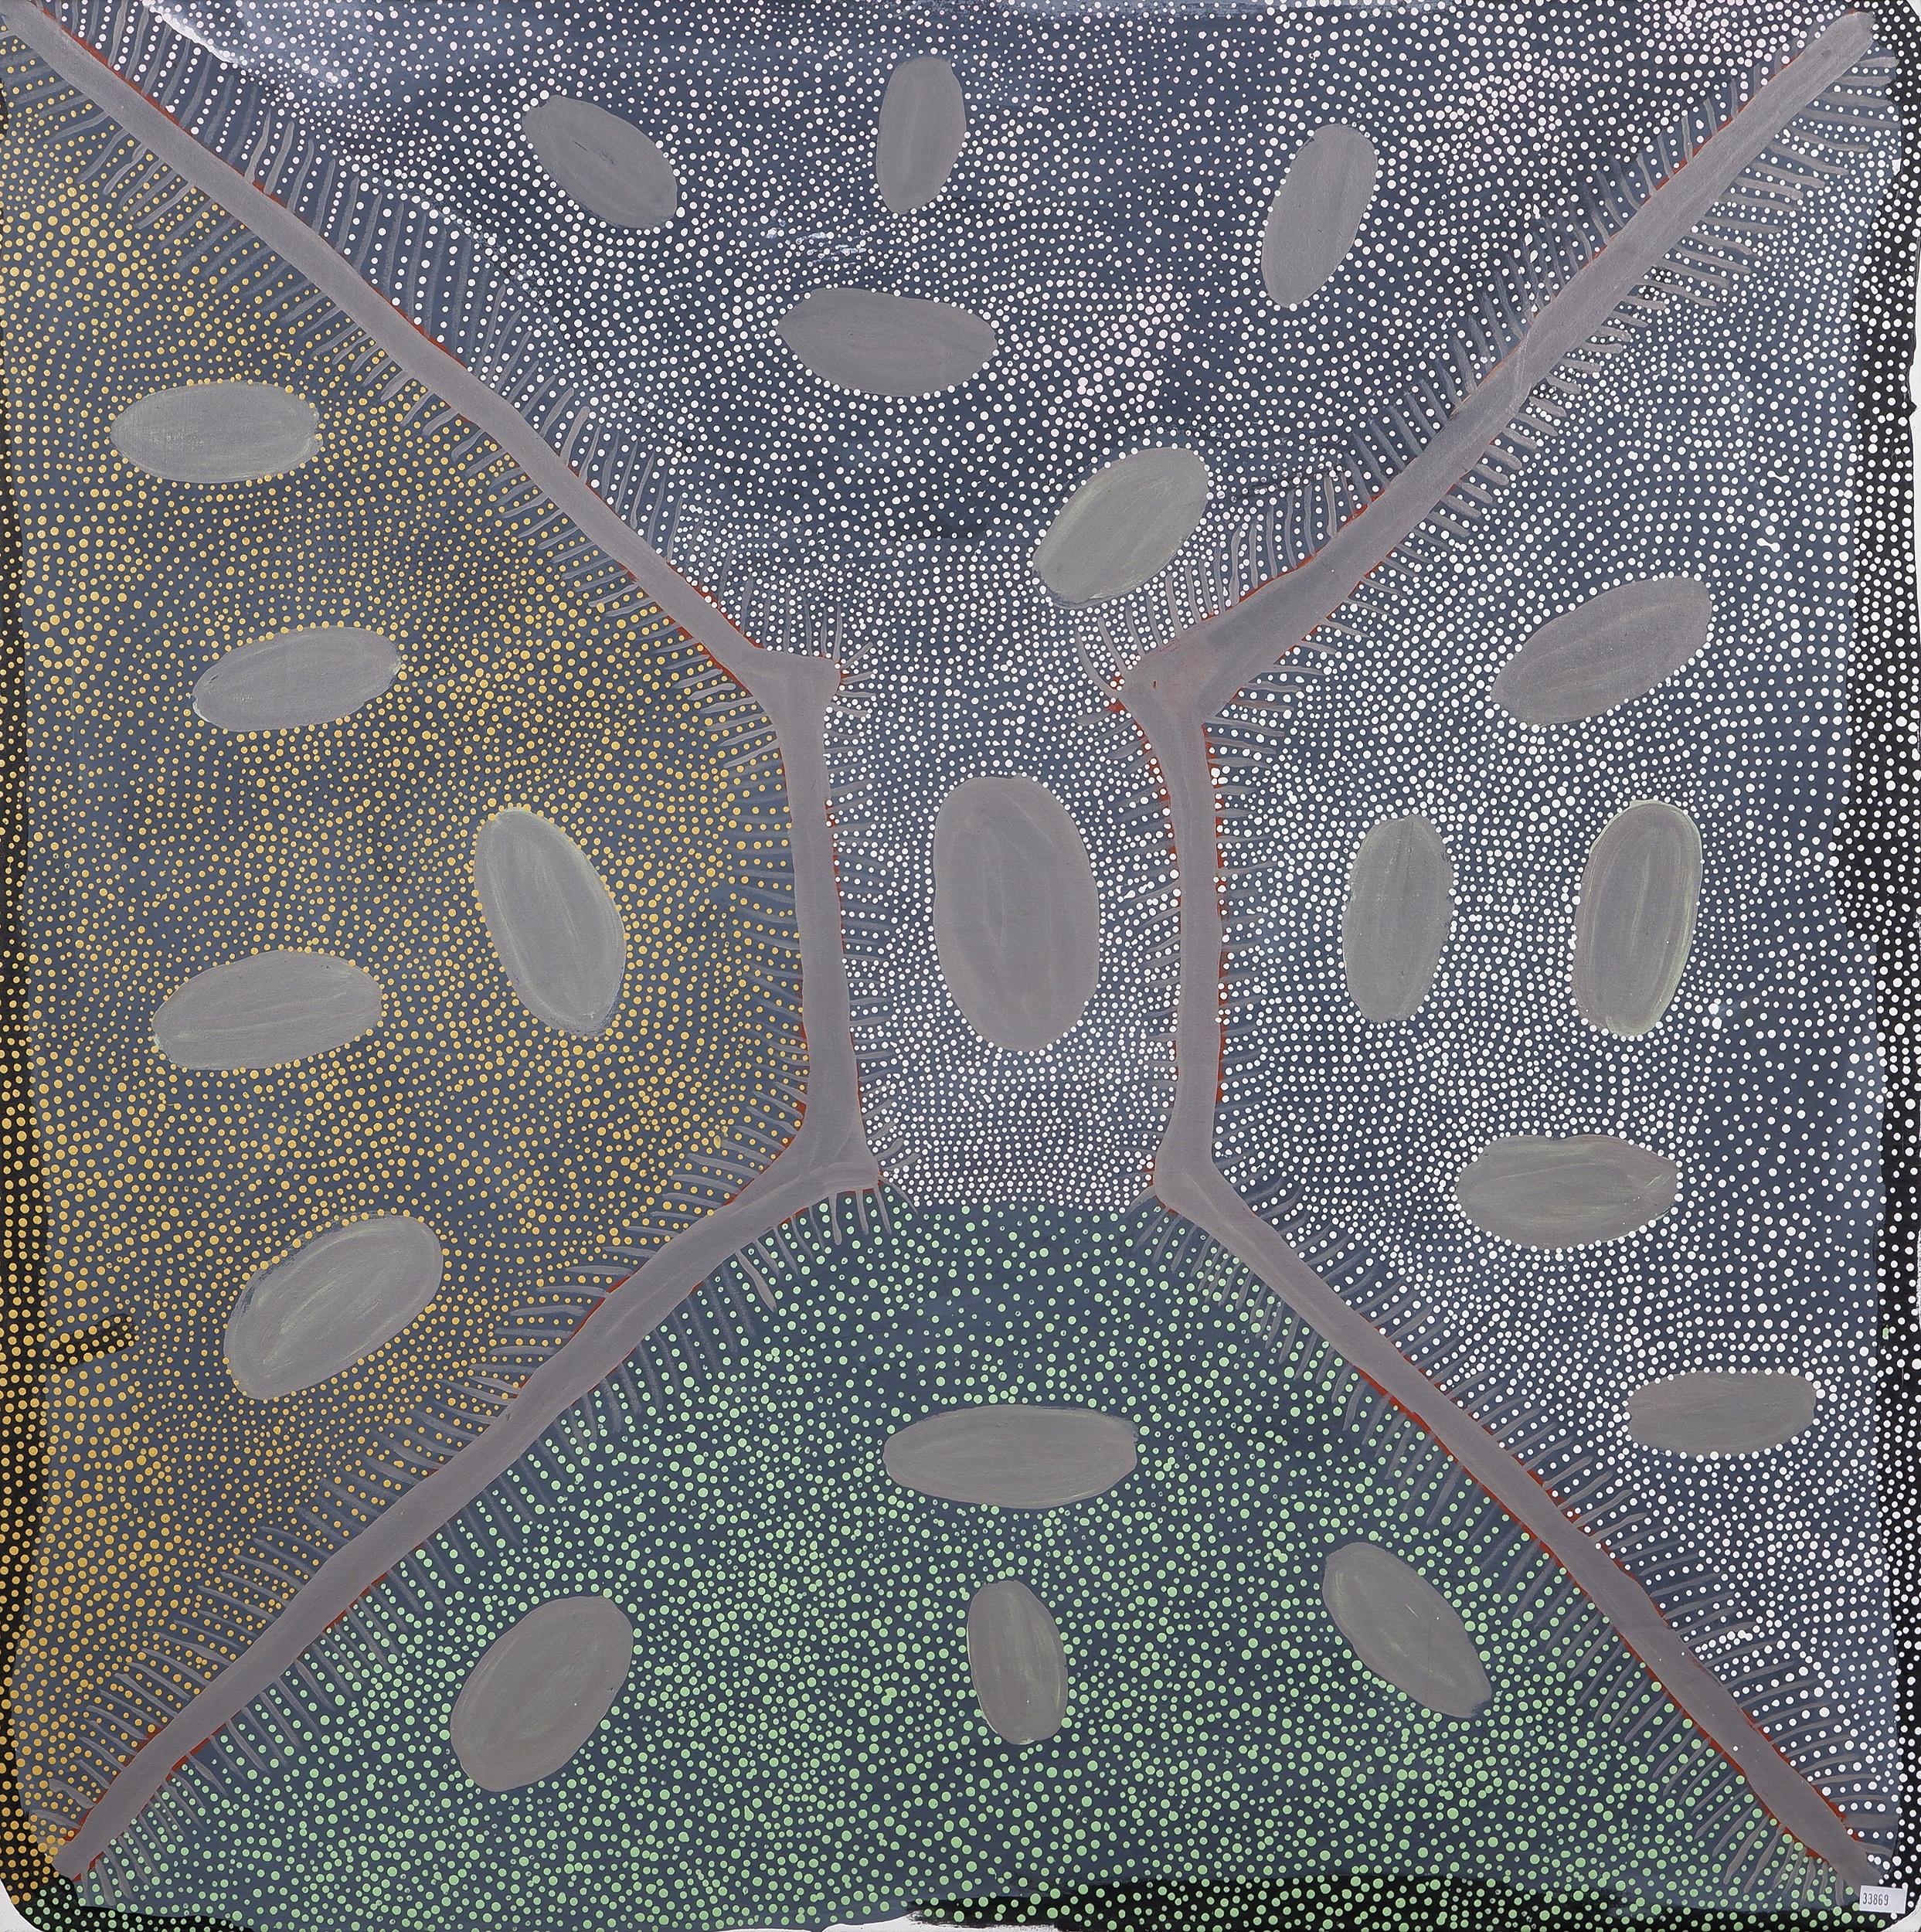 'Ada Bird Petyarre (c1930-2009, Eastern Anmatyerr language group), Womens Dreaming - Aweyle 1995, Acrylic on Canvas '